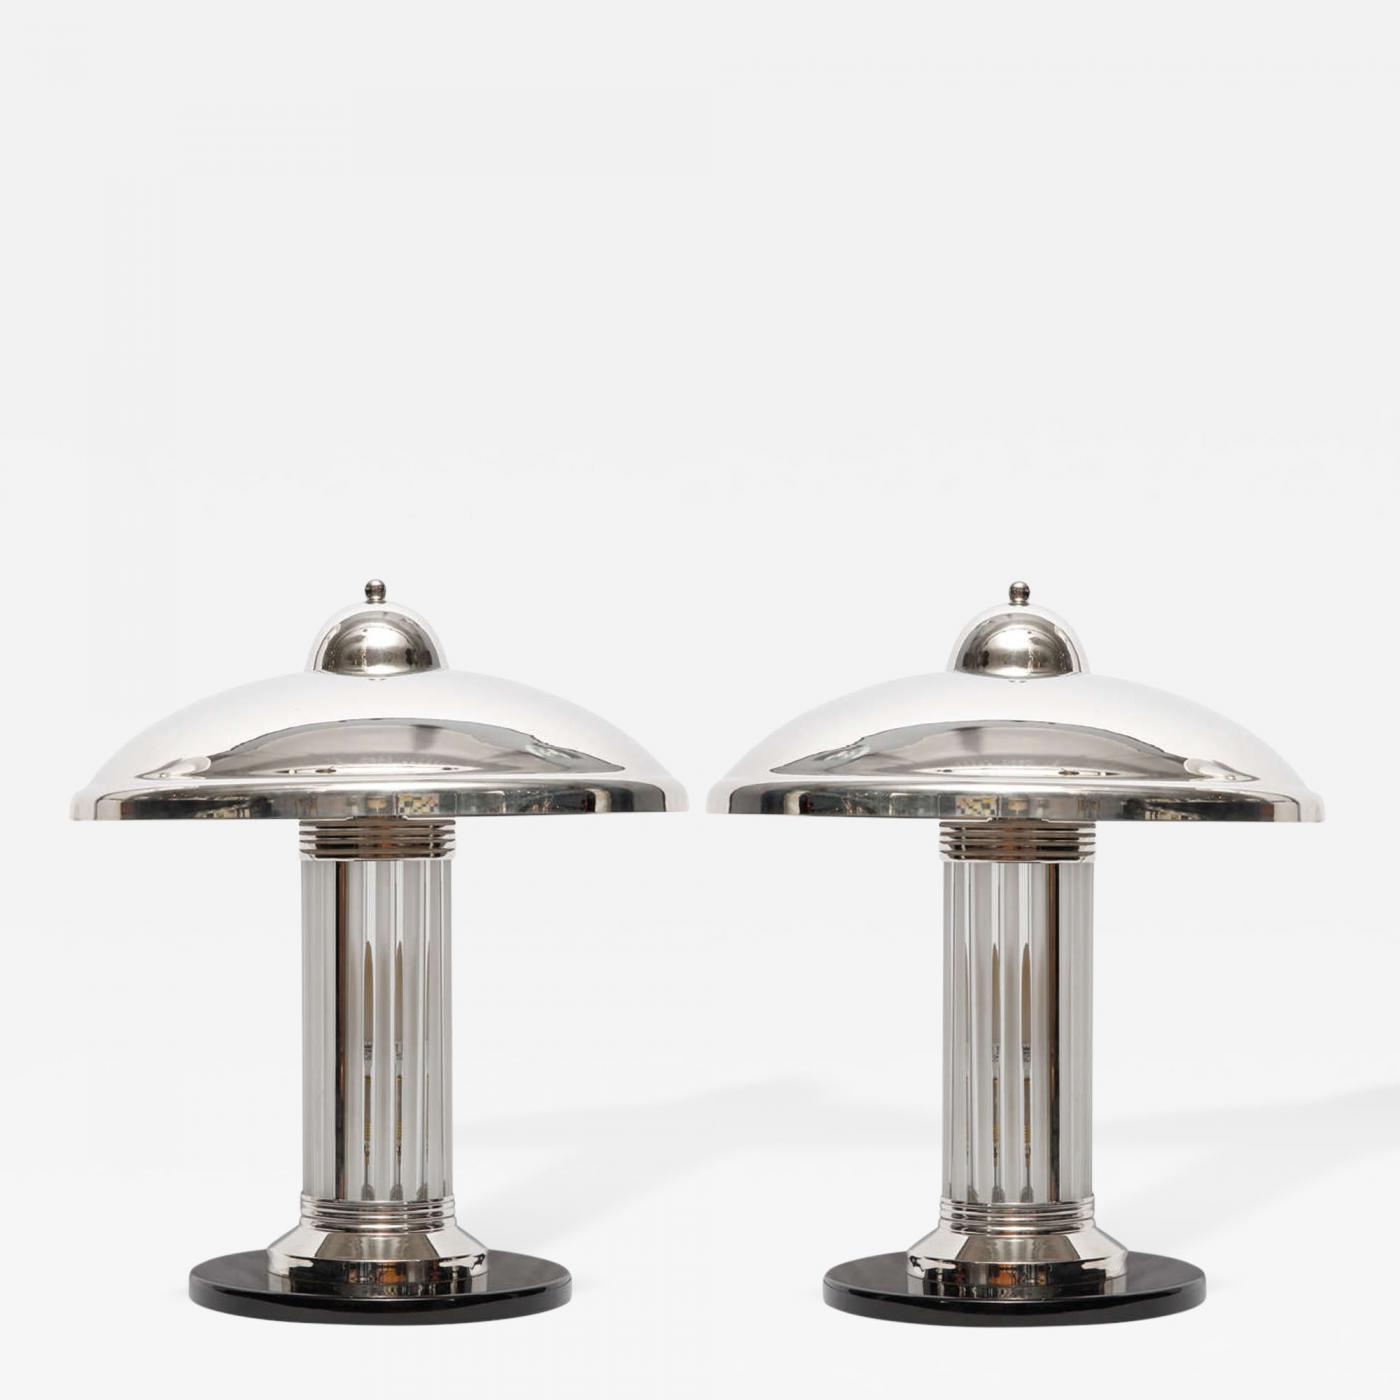 Pair French Art Deco Petitot Table Or Desk Lamps